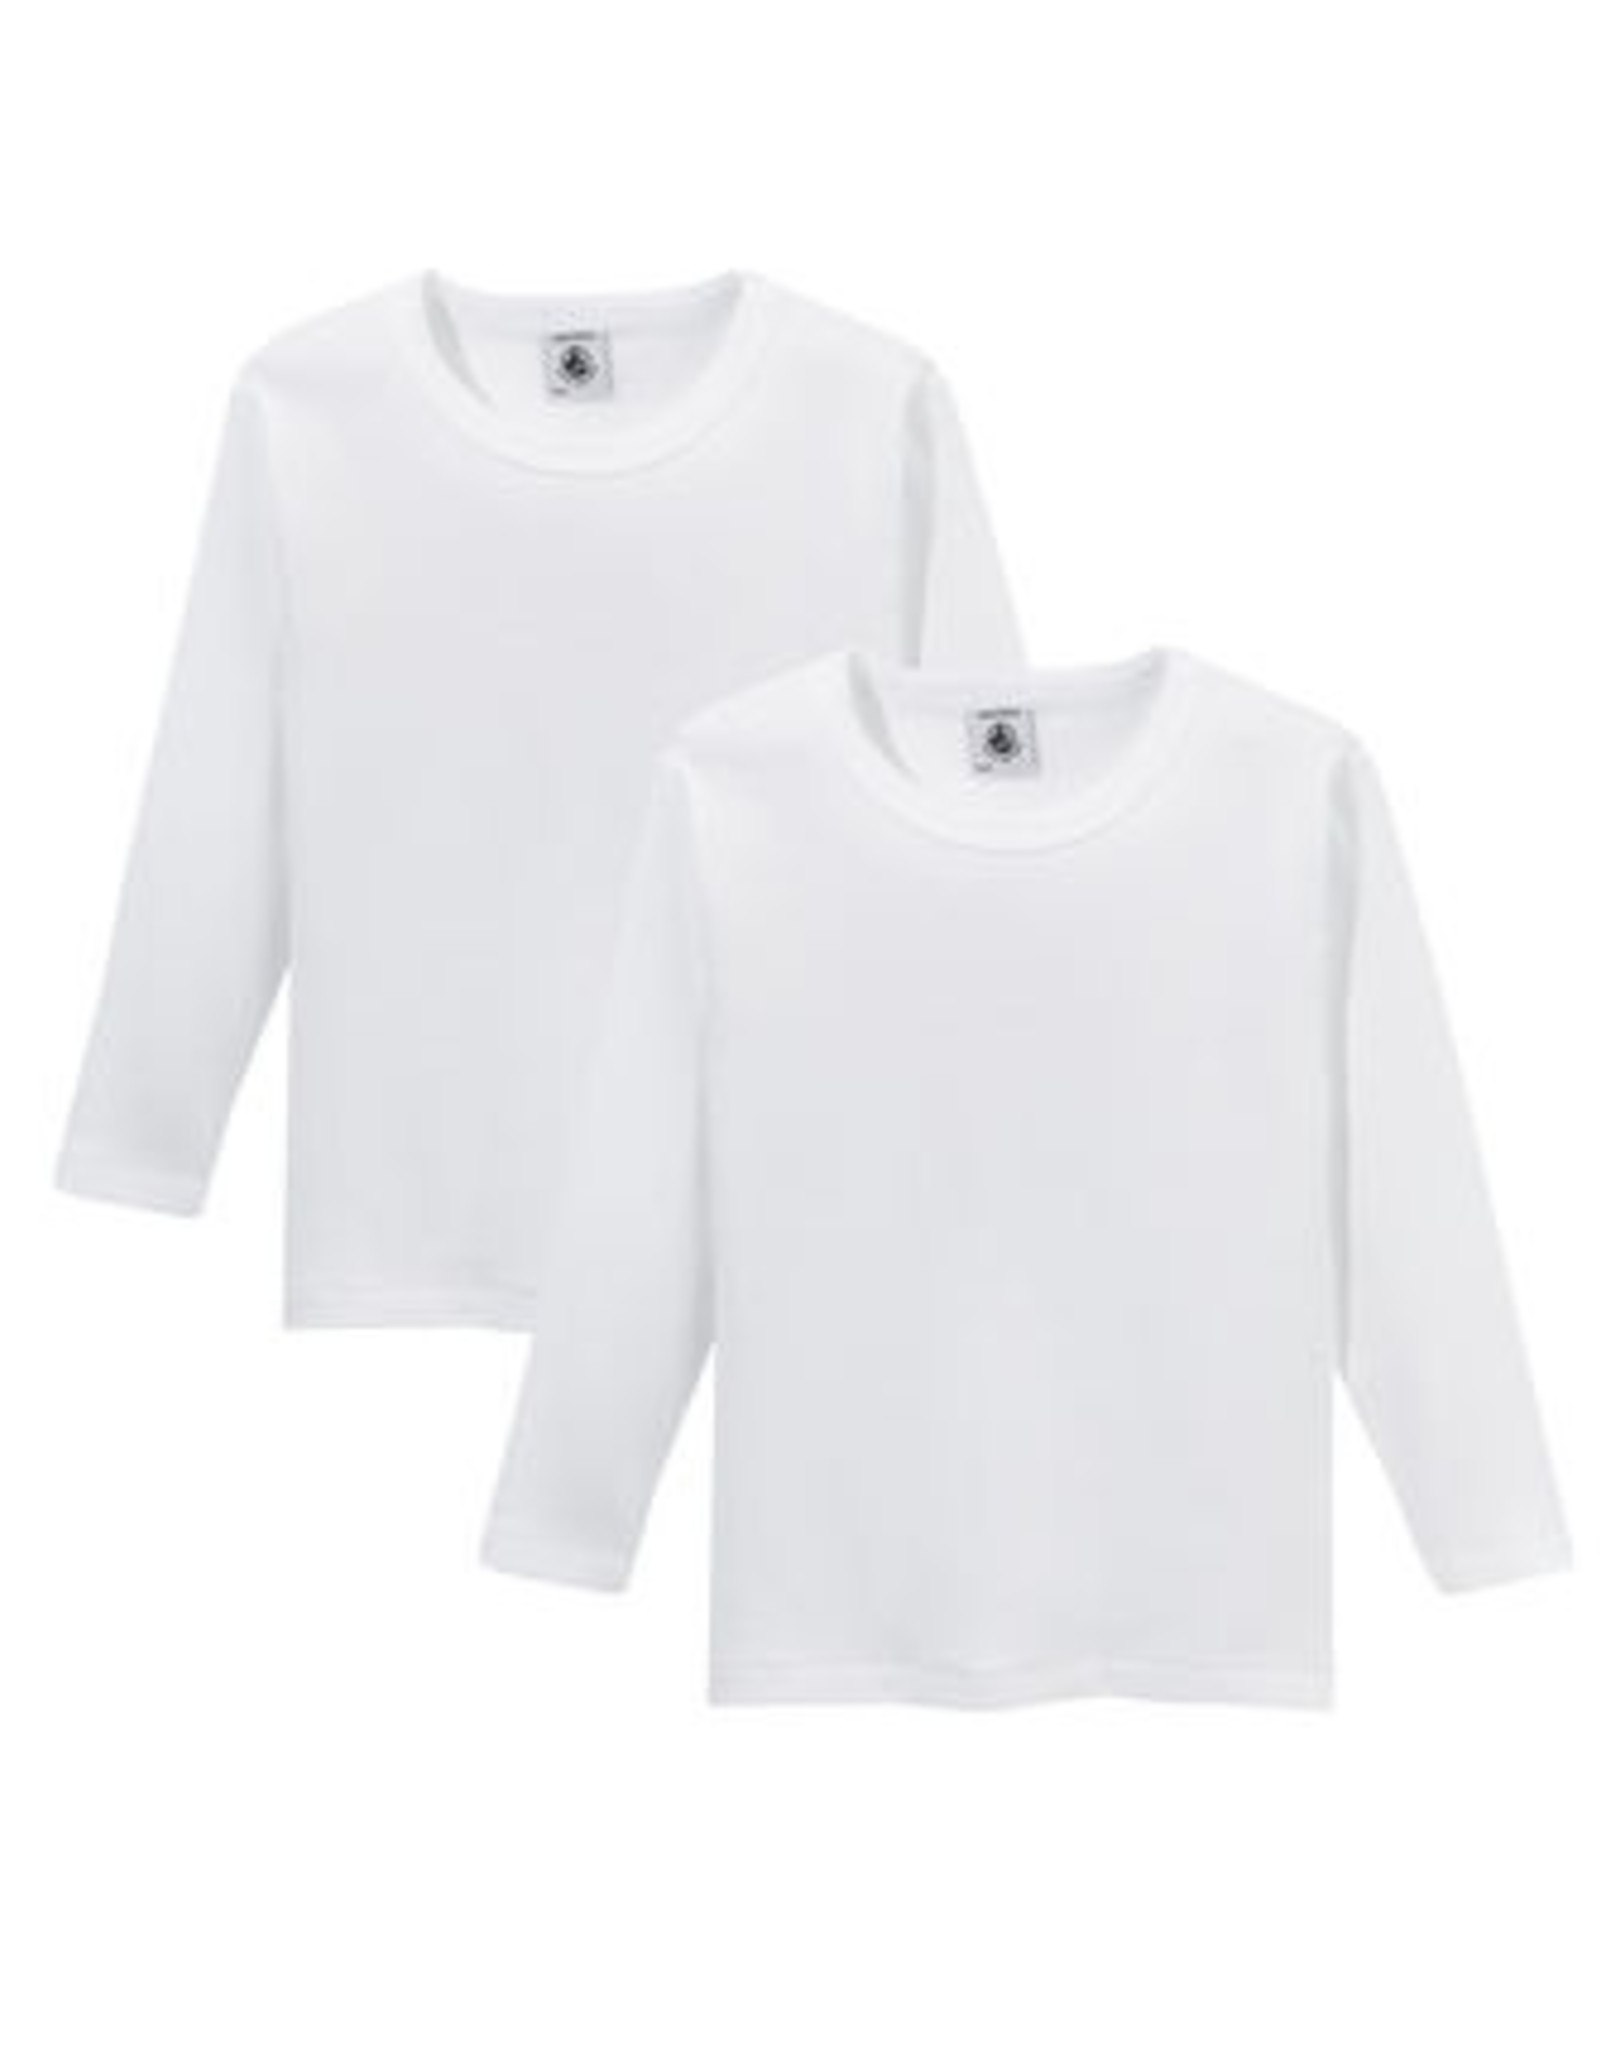 T-Shirt - 2-Piece Set